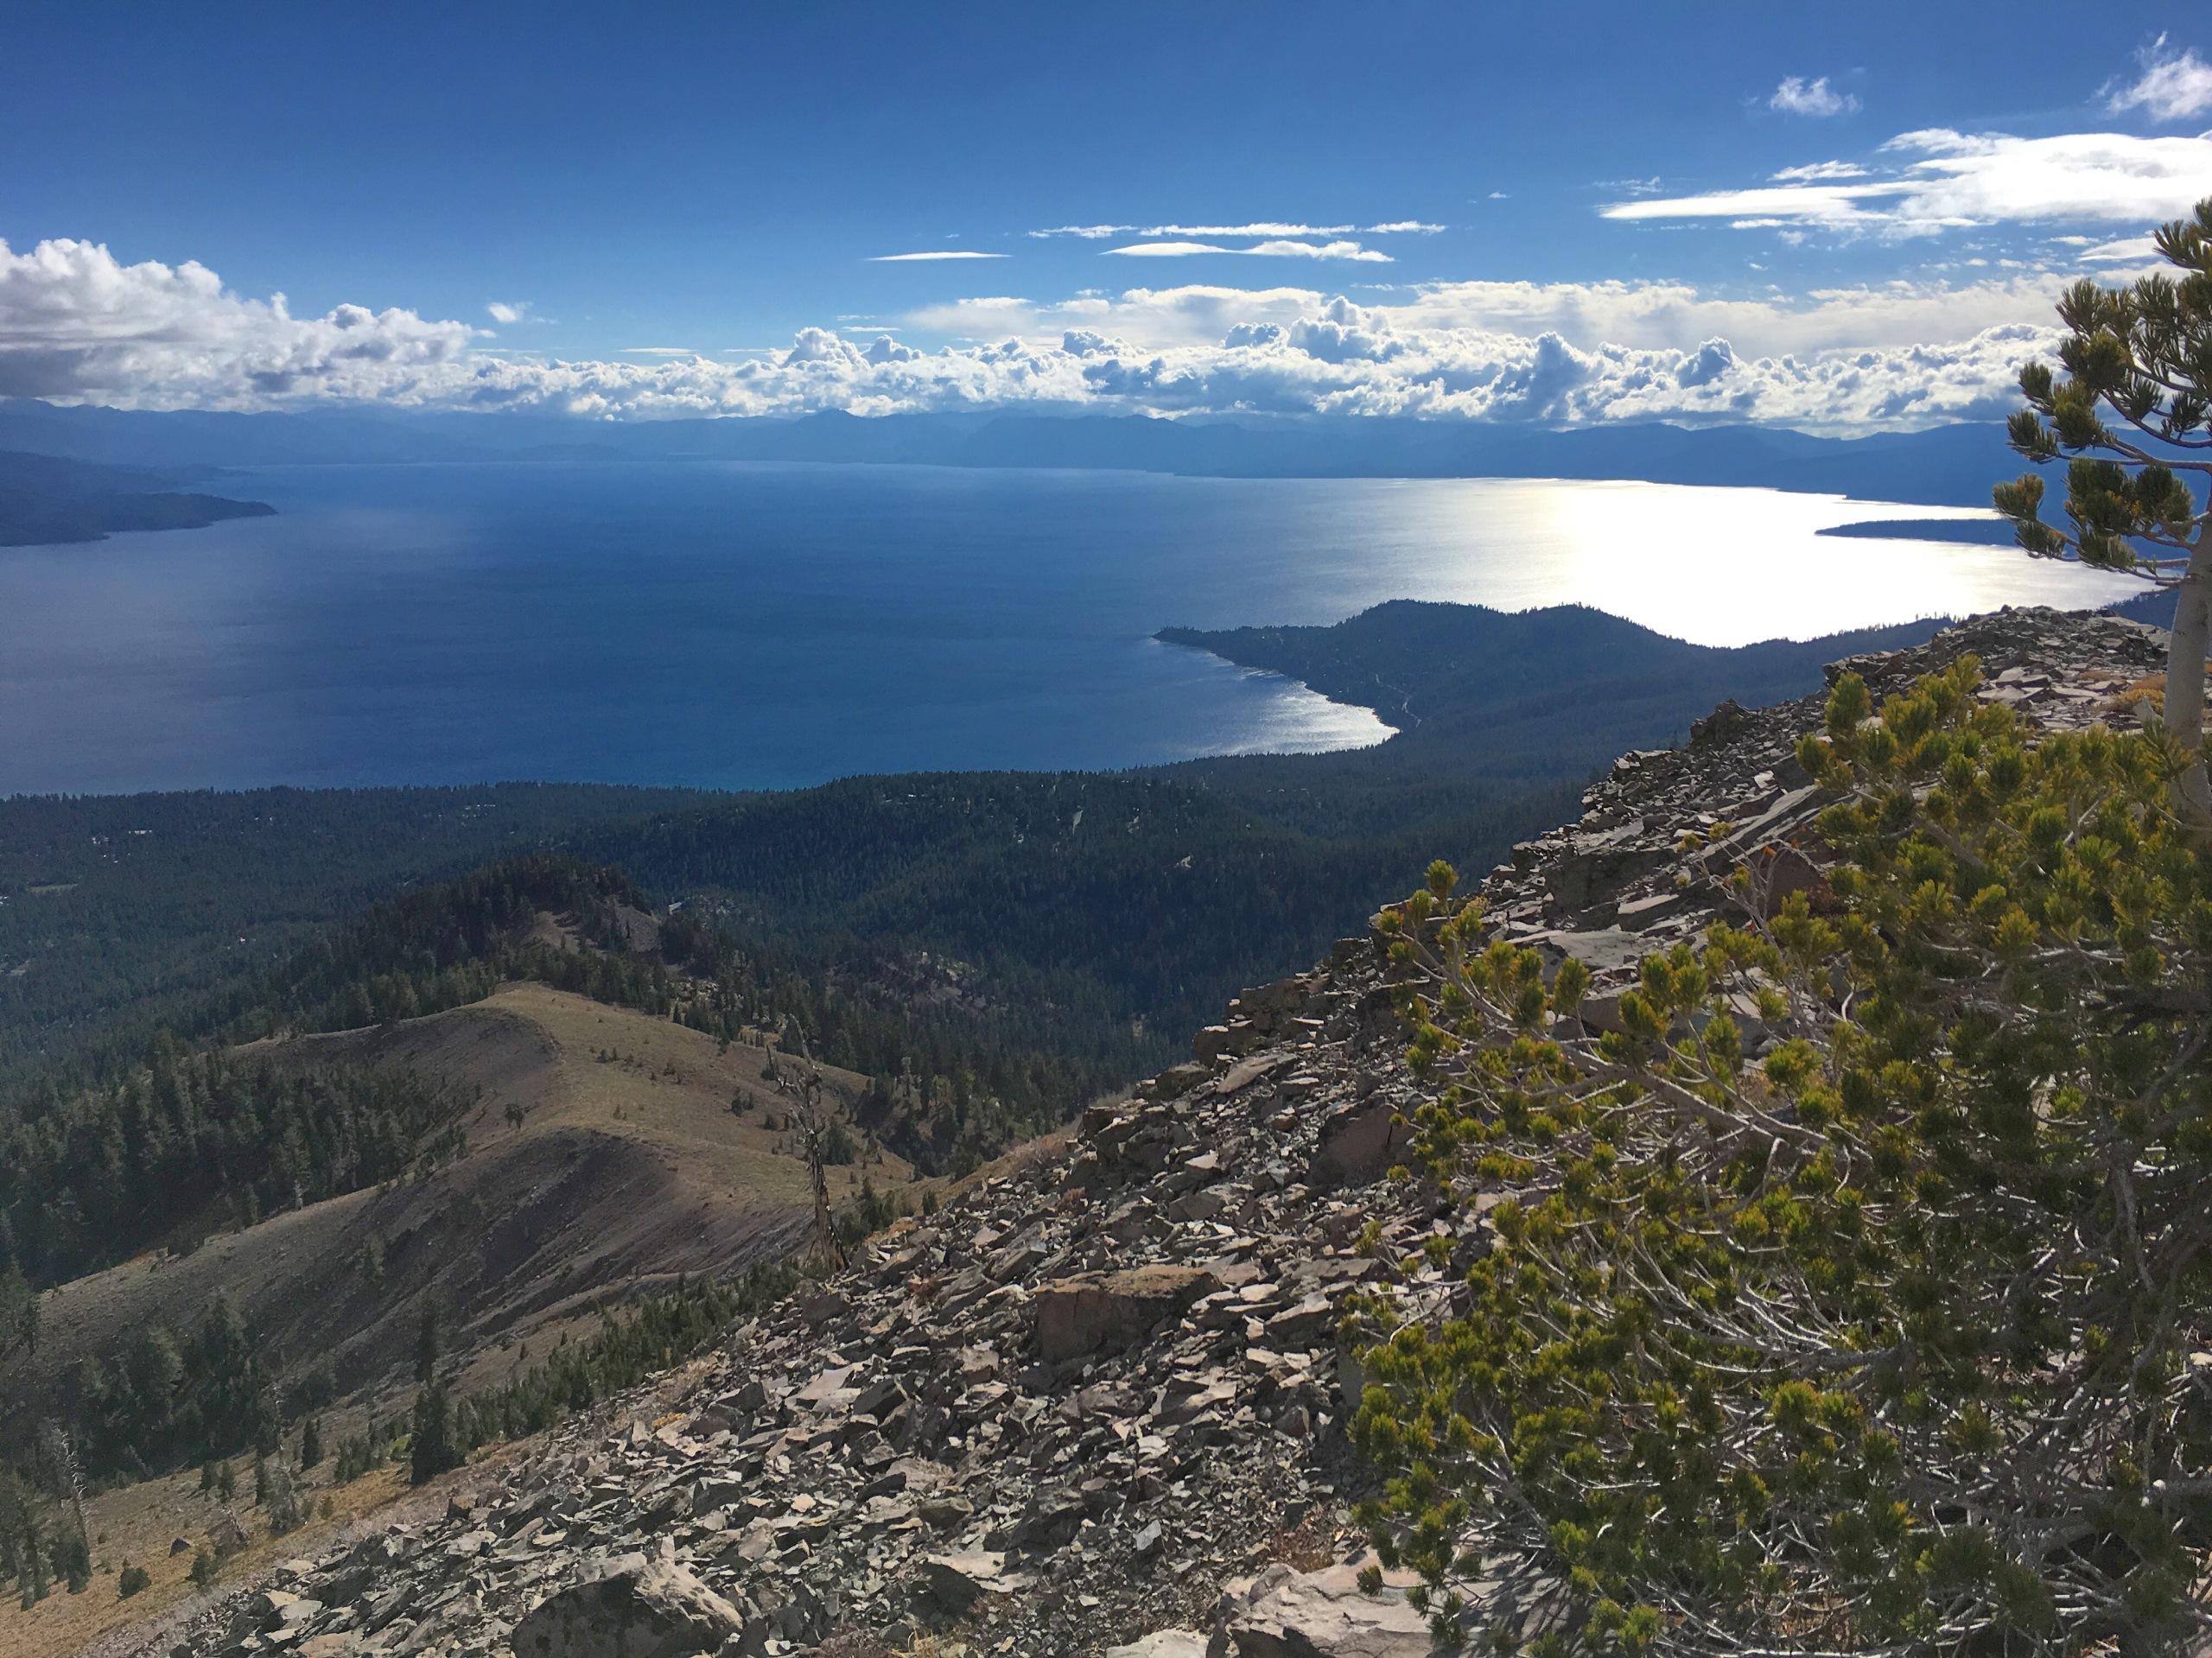 Rose Knob Peak, North Lake Tahoe